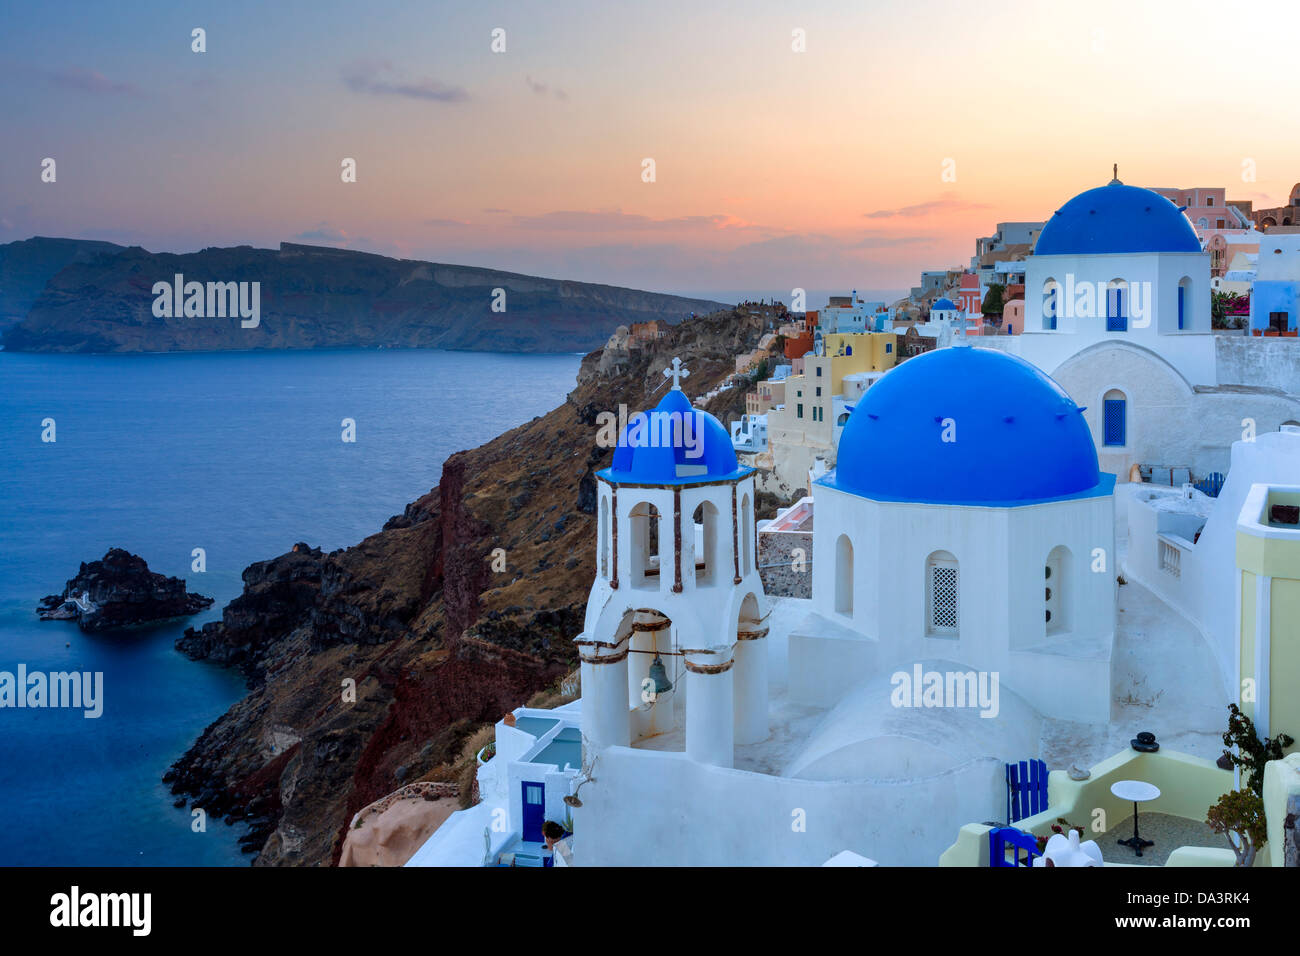 Dusk over blue domed churches at Oia Santorini Greece - Stock Image